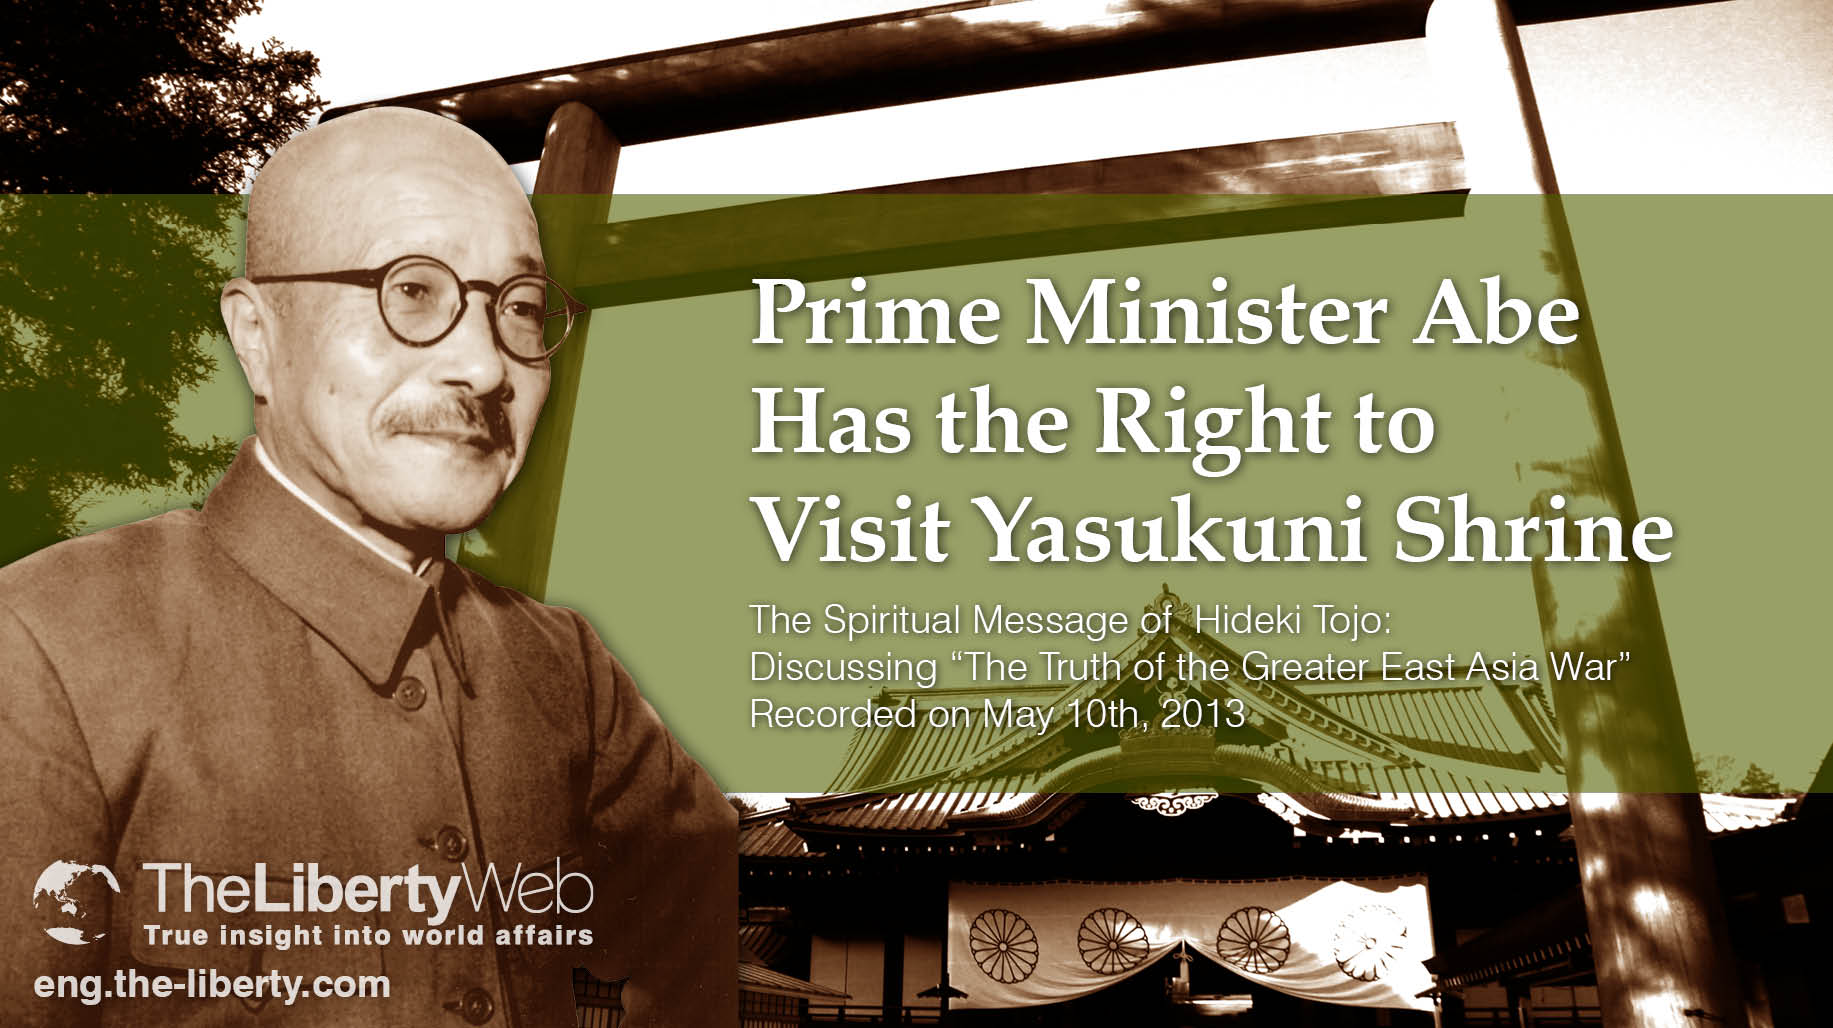 Prime Minister Abe Has The Right To Visit Yasukuni Shrine